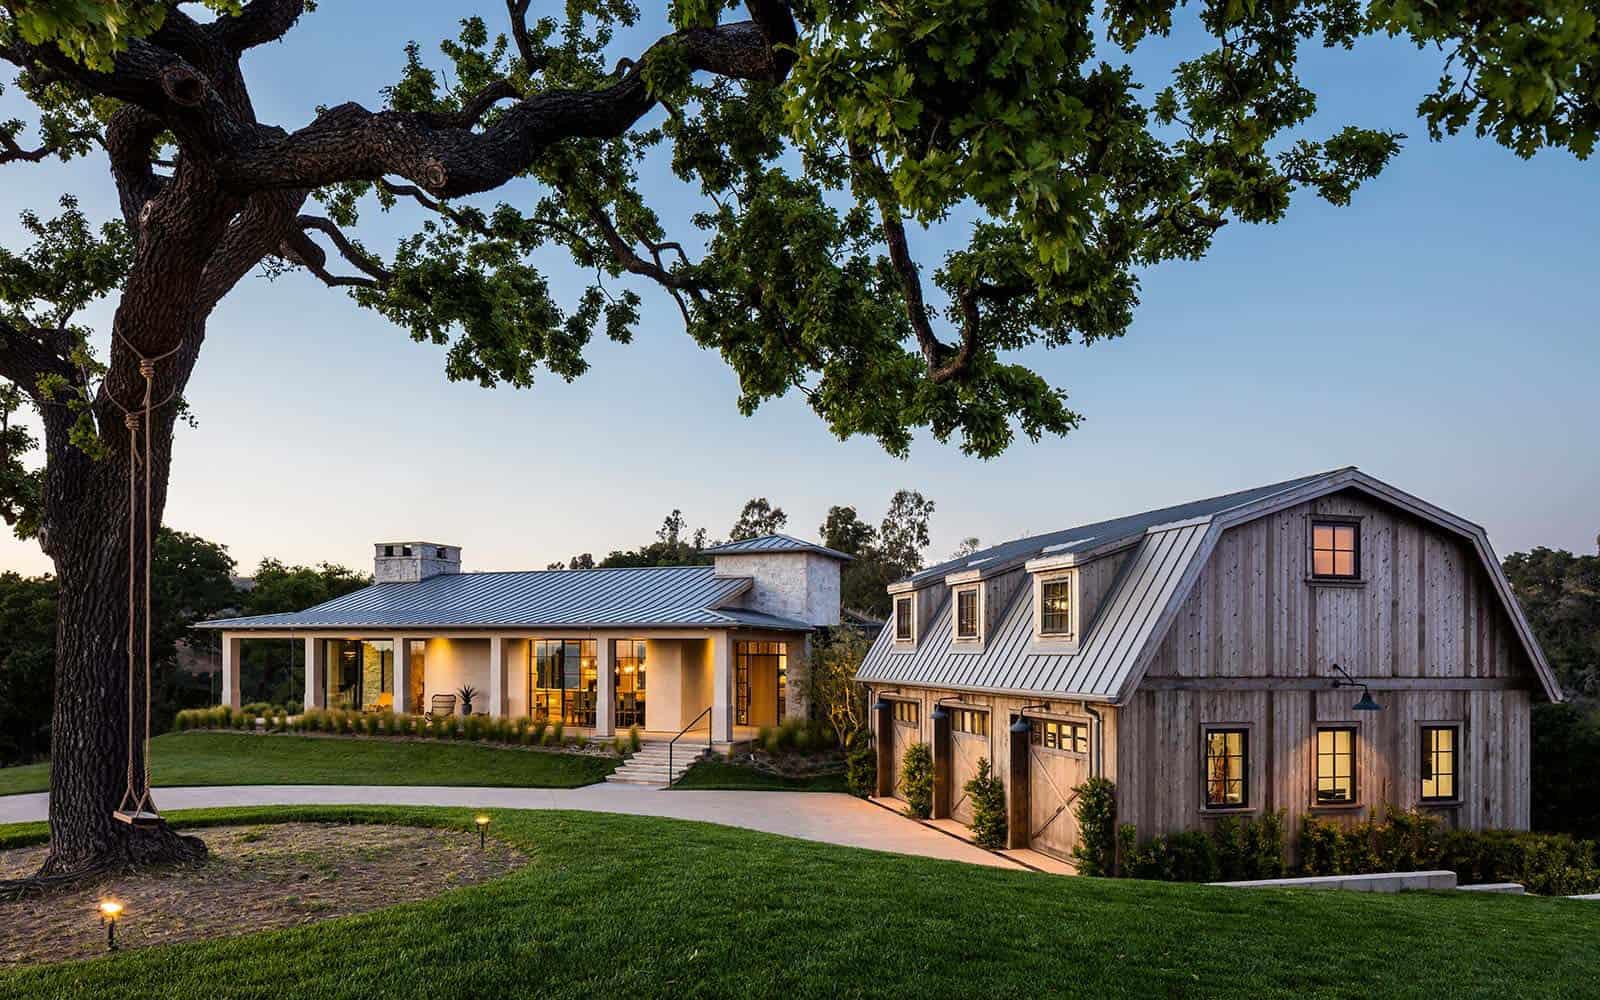 Breathtaking Santa Barbara country style home in Santa Ynez Valley